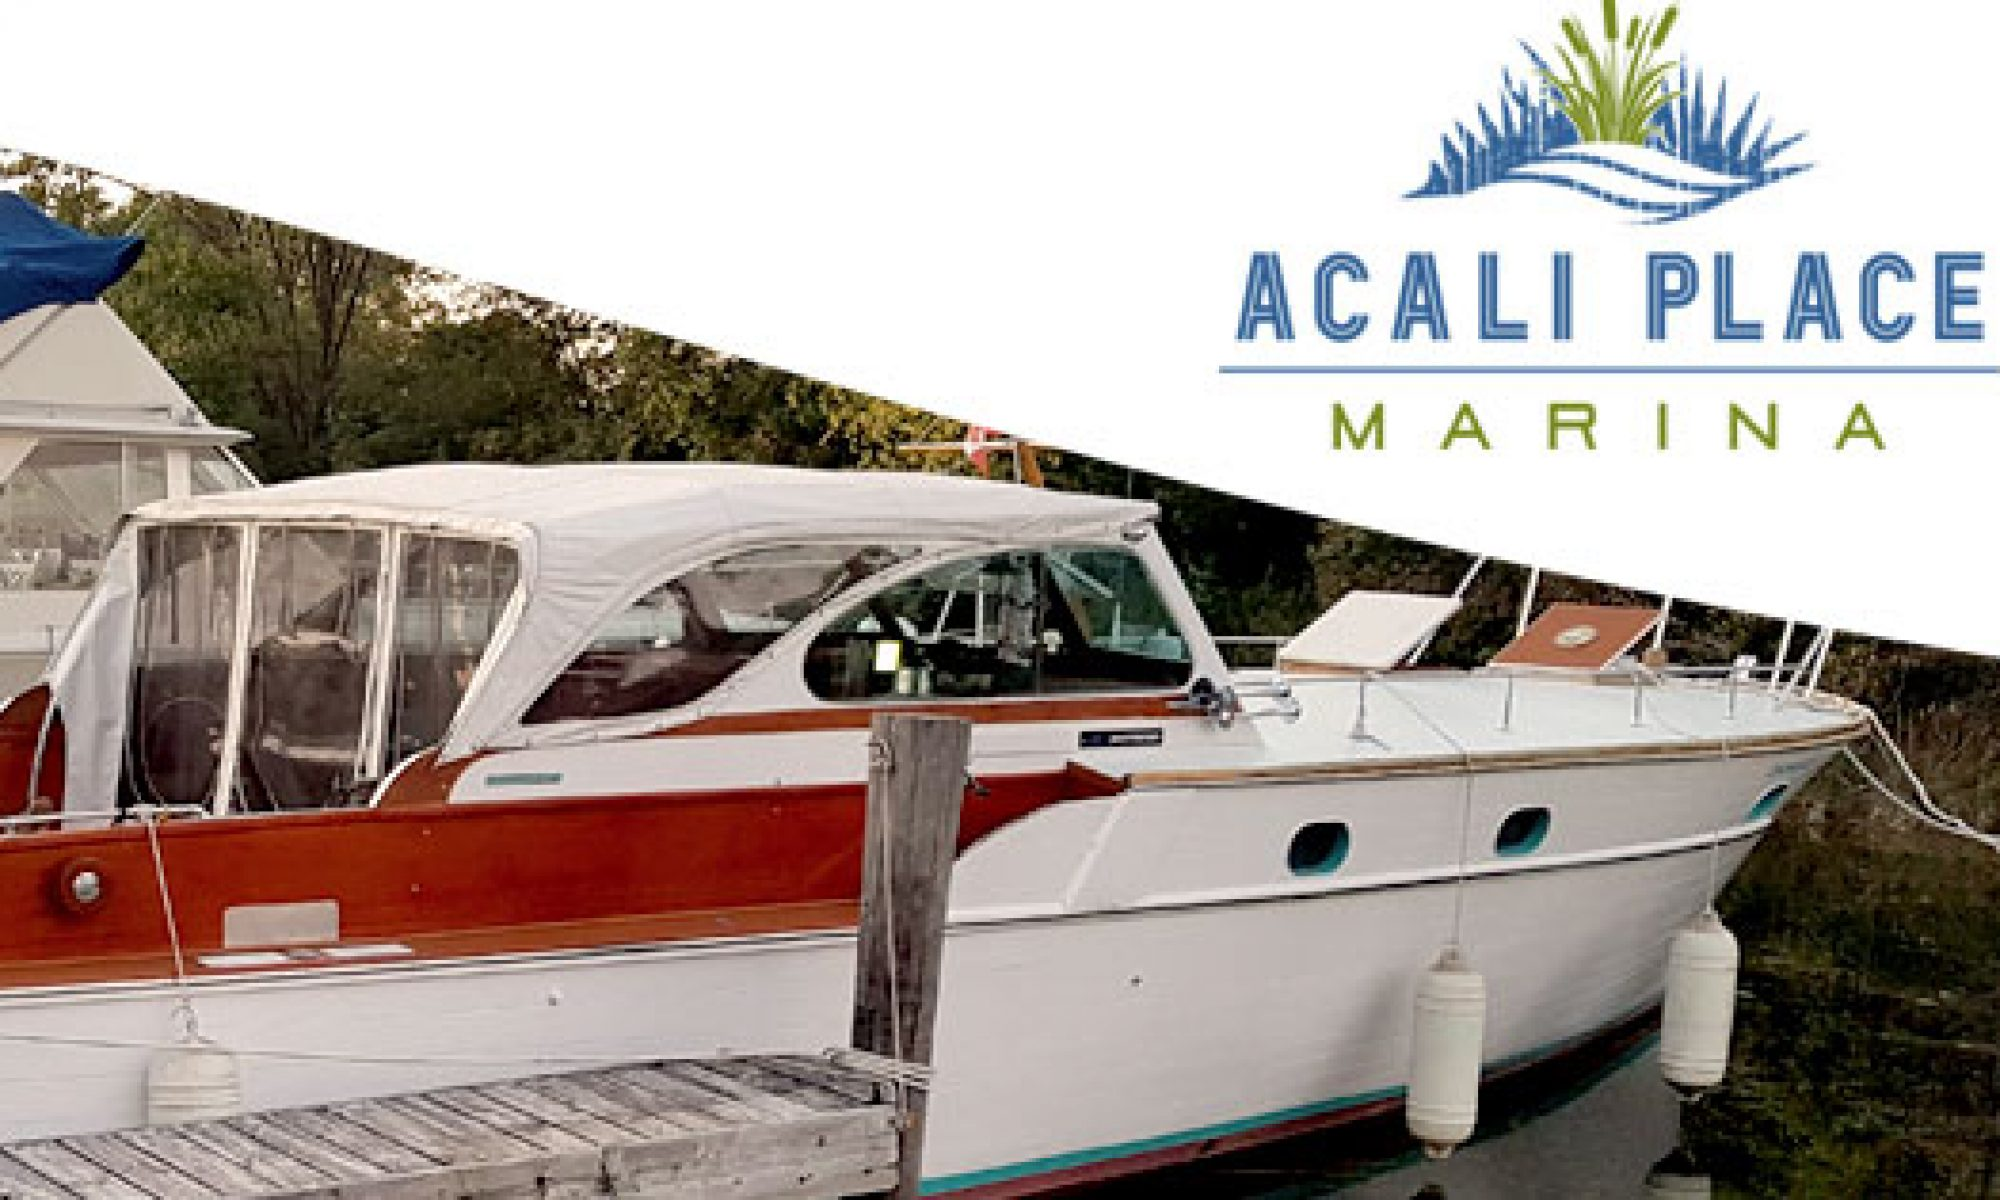 Acali Place Marina